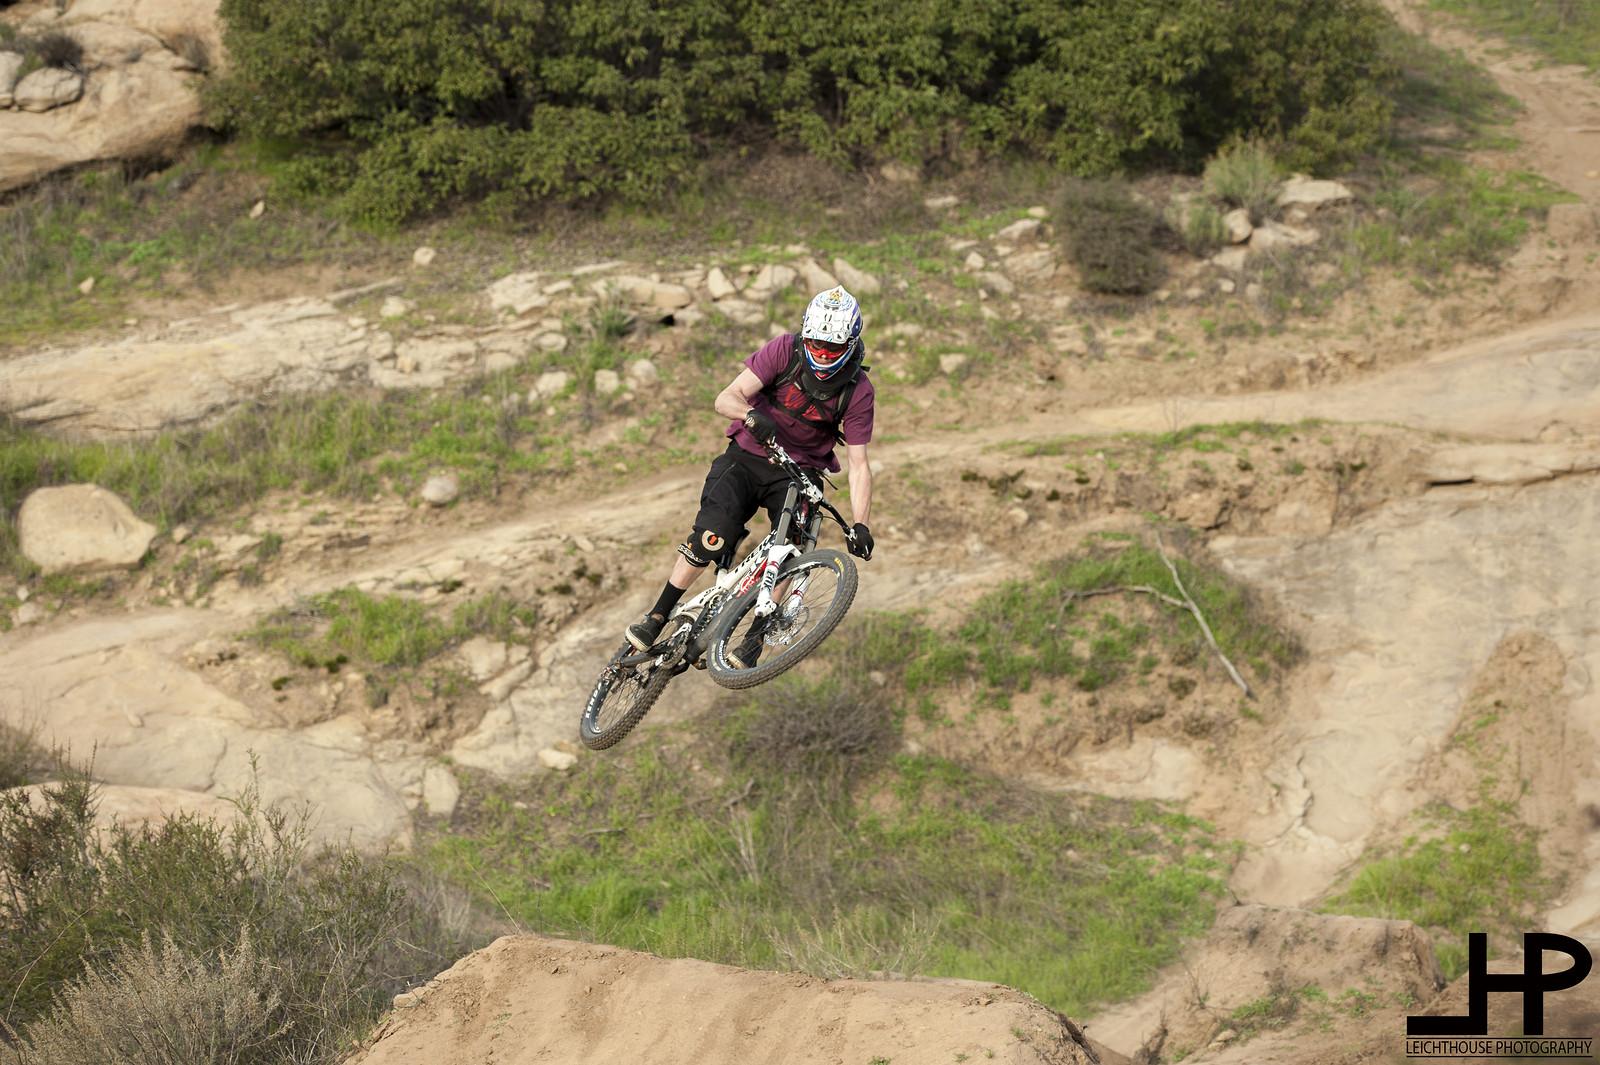 Curtis doublin' - LeichtHouse photography - Mountain Biking Pictures - Vital MTB